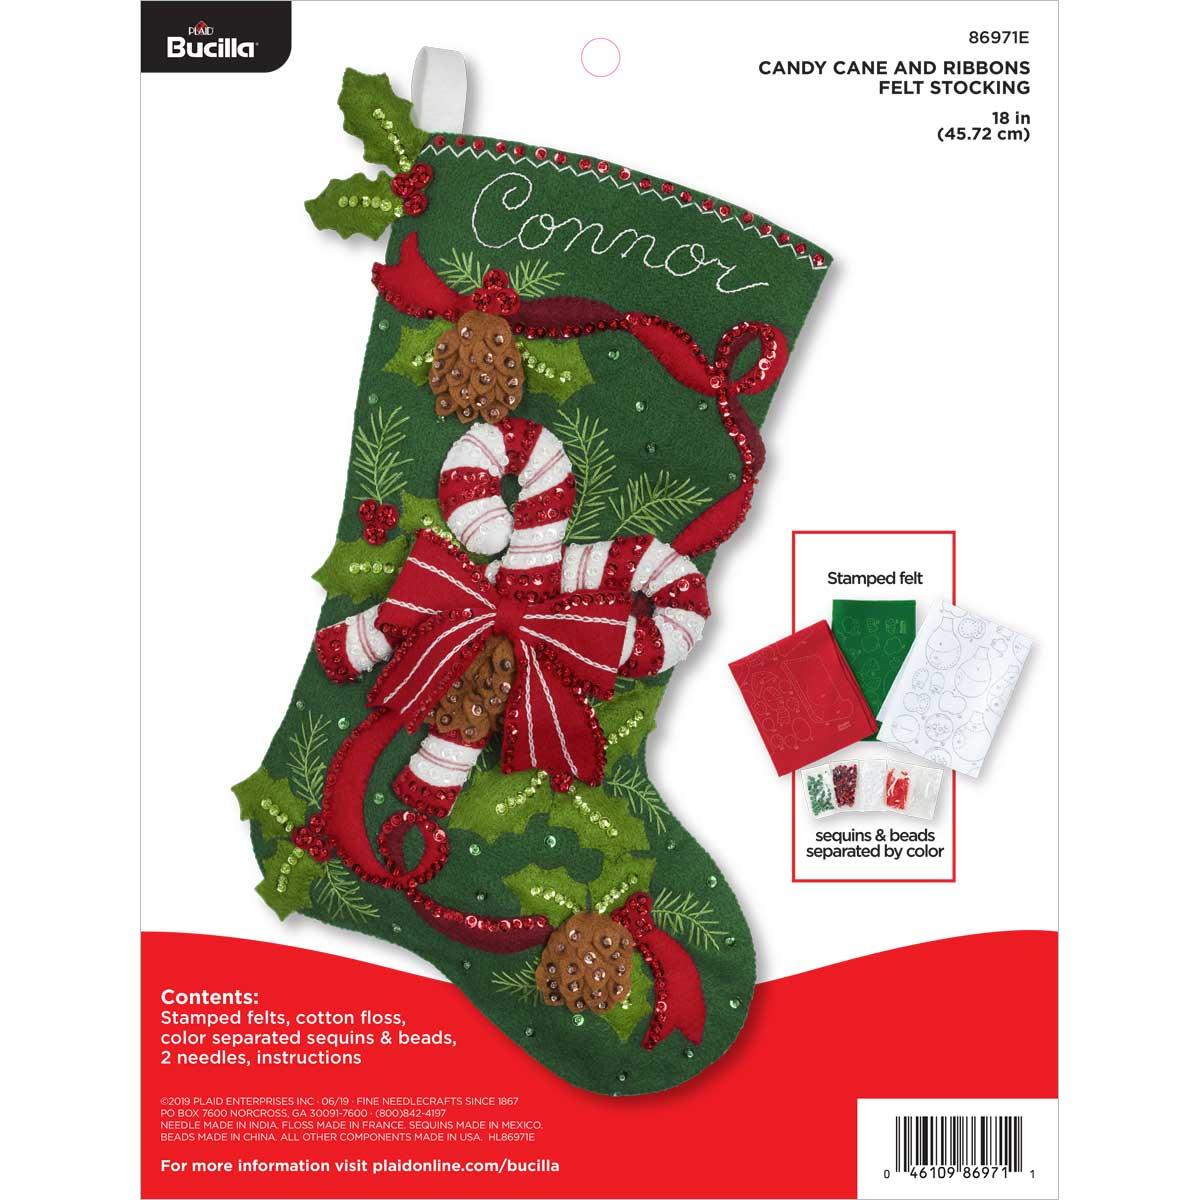 Bucilla ® Seasonal - Felt - Stocking Kits - Candy Cane and Ribbons - 86971E